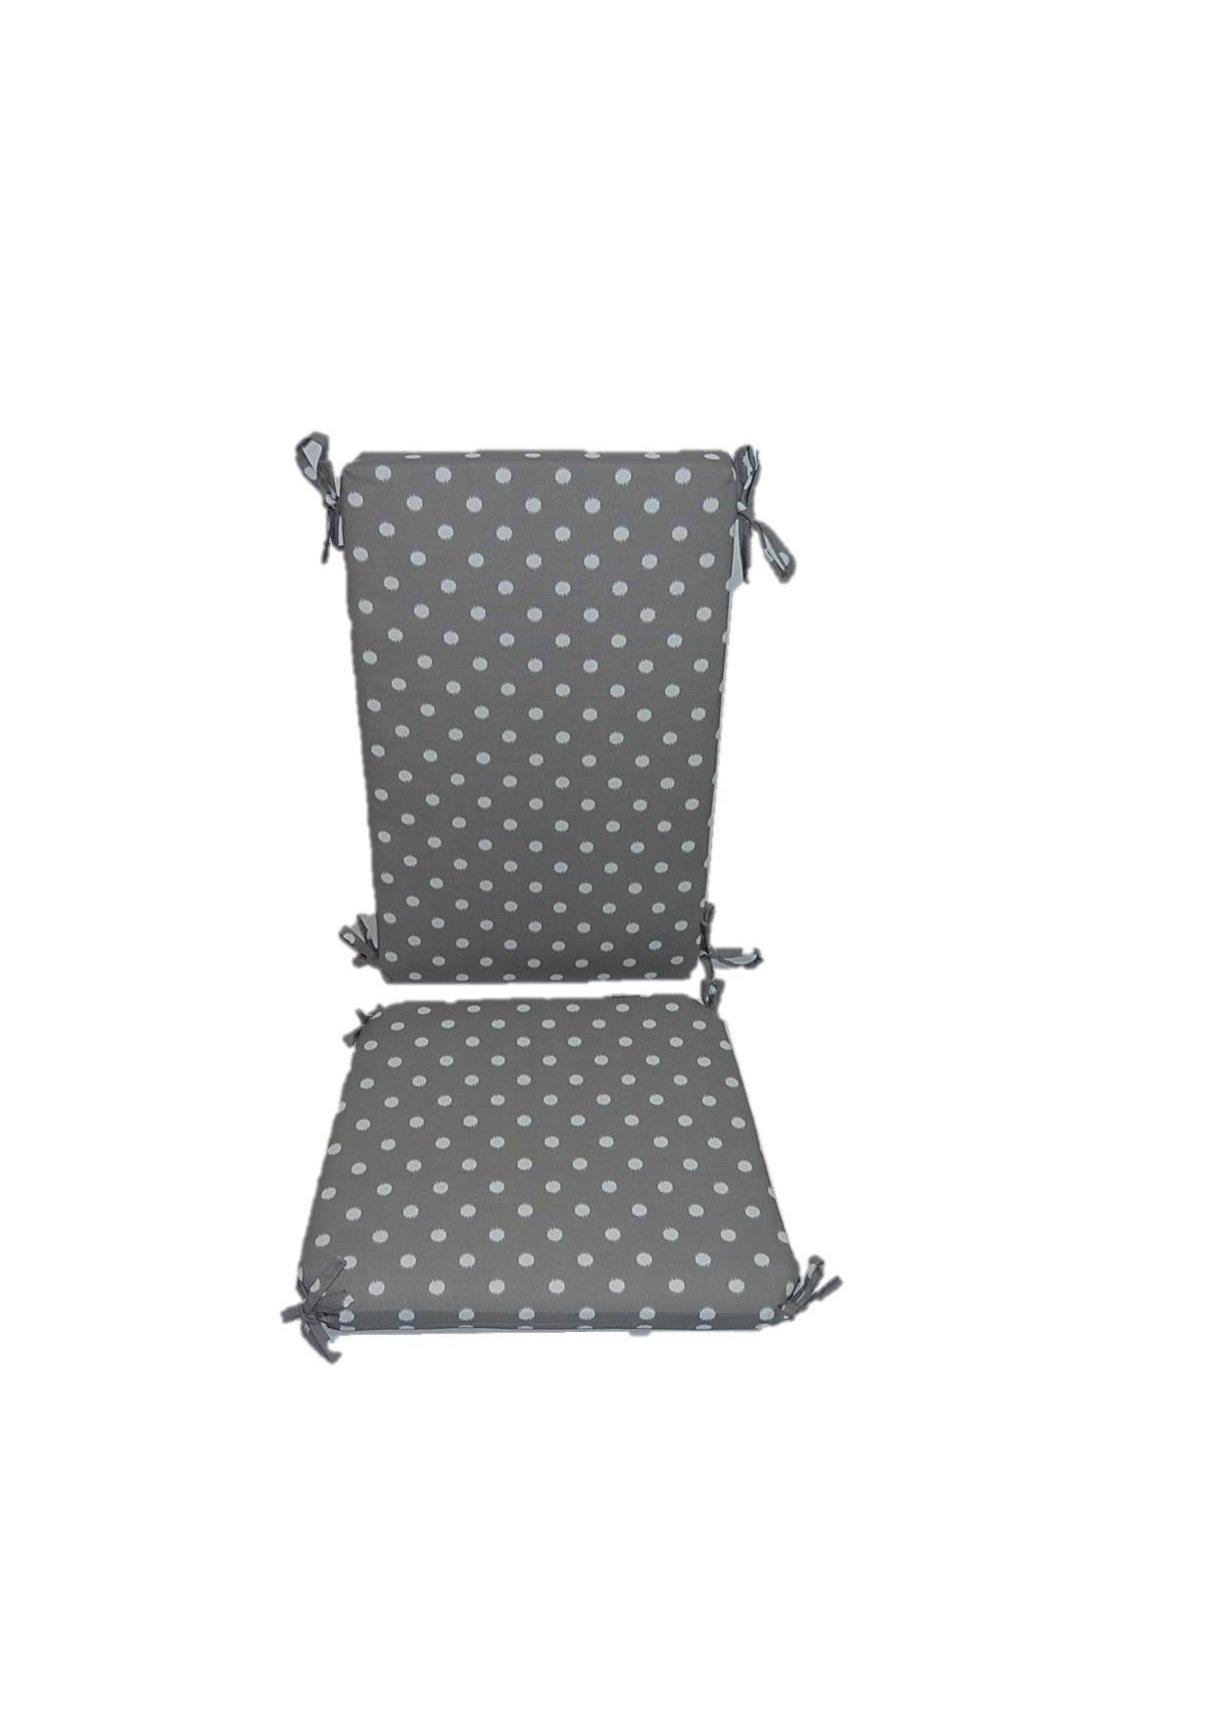 Indoor / Outdoor Gray / Grey and White Ikat Polka Dot Rocking Chair 2 Pc Foam Cushion Set ~ Fits Cracker Barrel Rocker